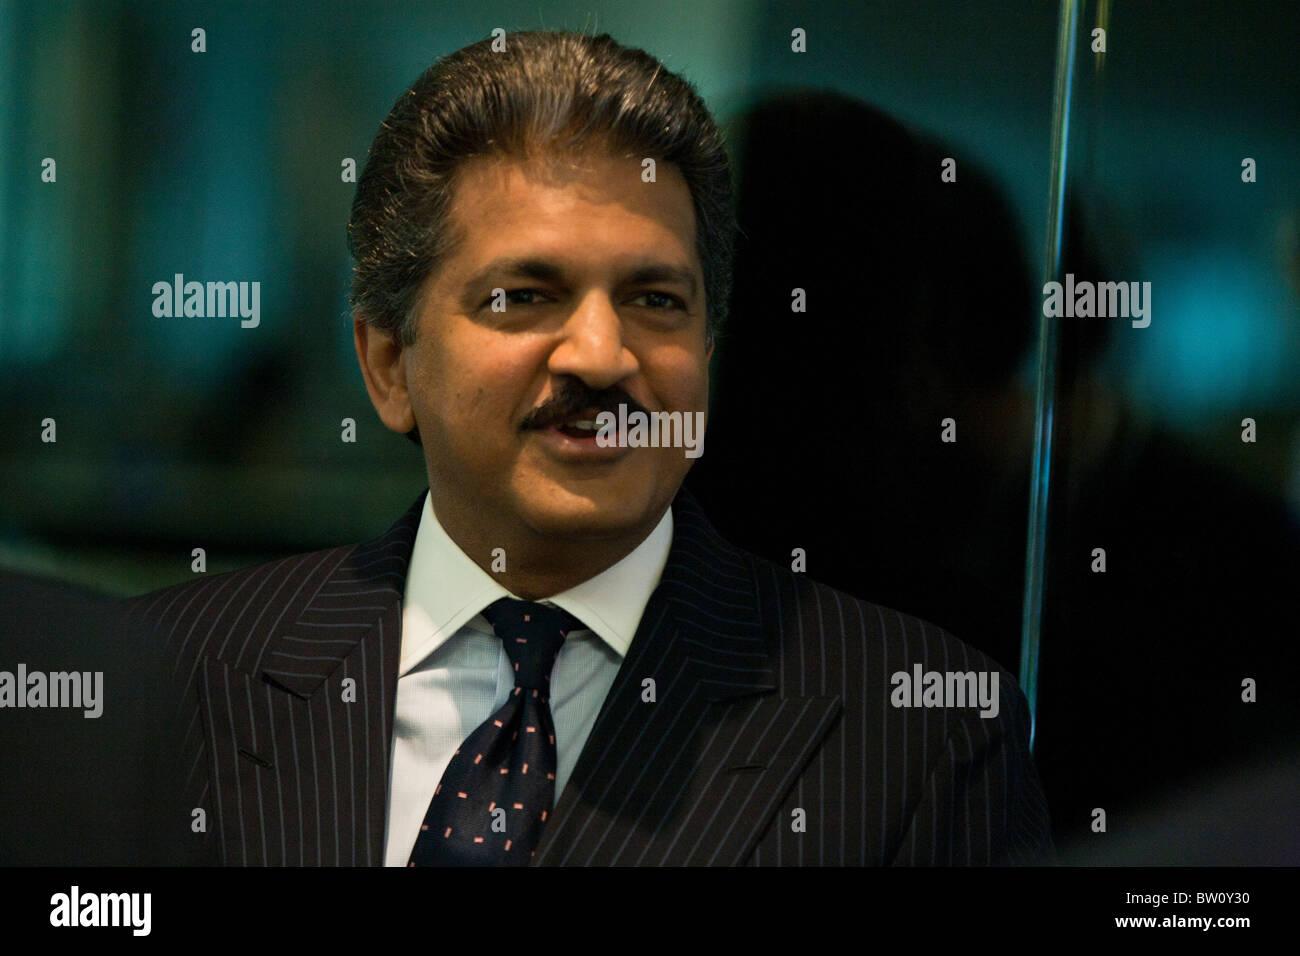 Anand Mahindra, vice chairman and managing director of Mahindra & Mahindra Ltd., in Singapore - Stock Image